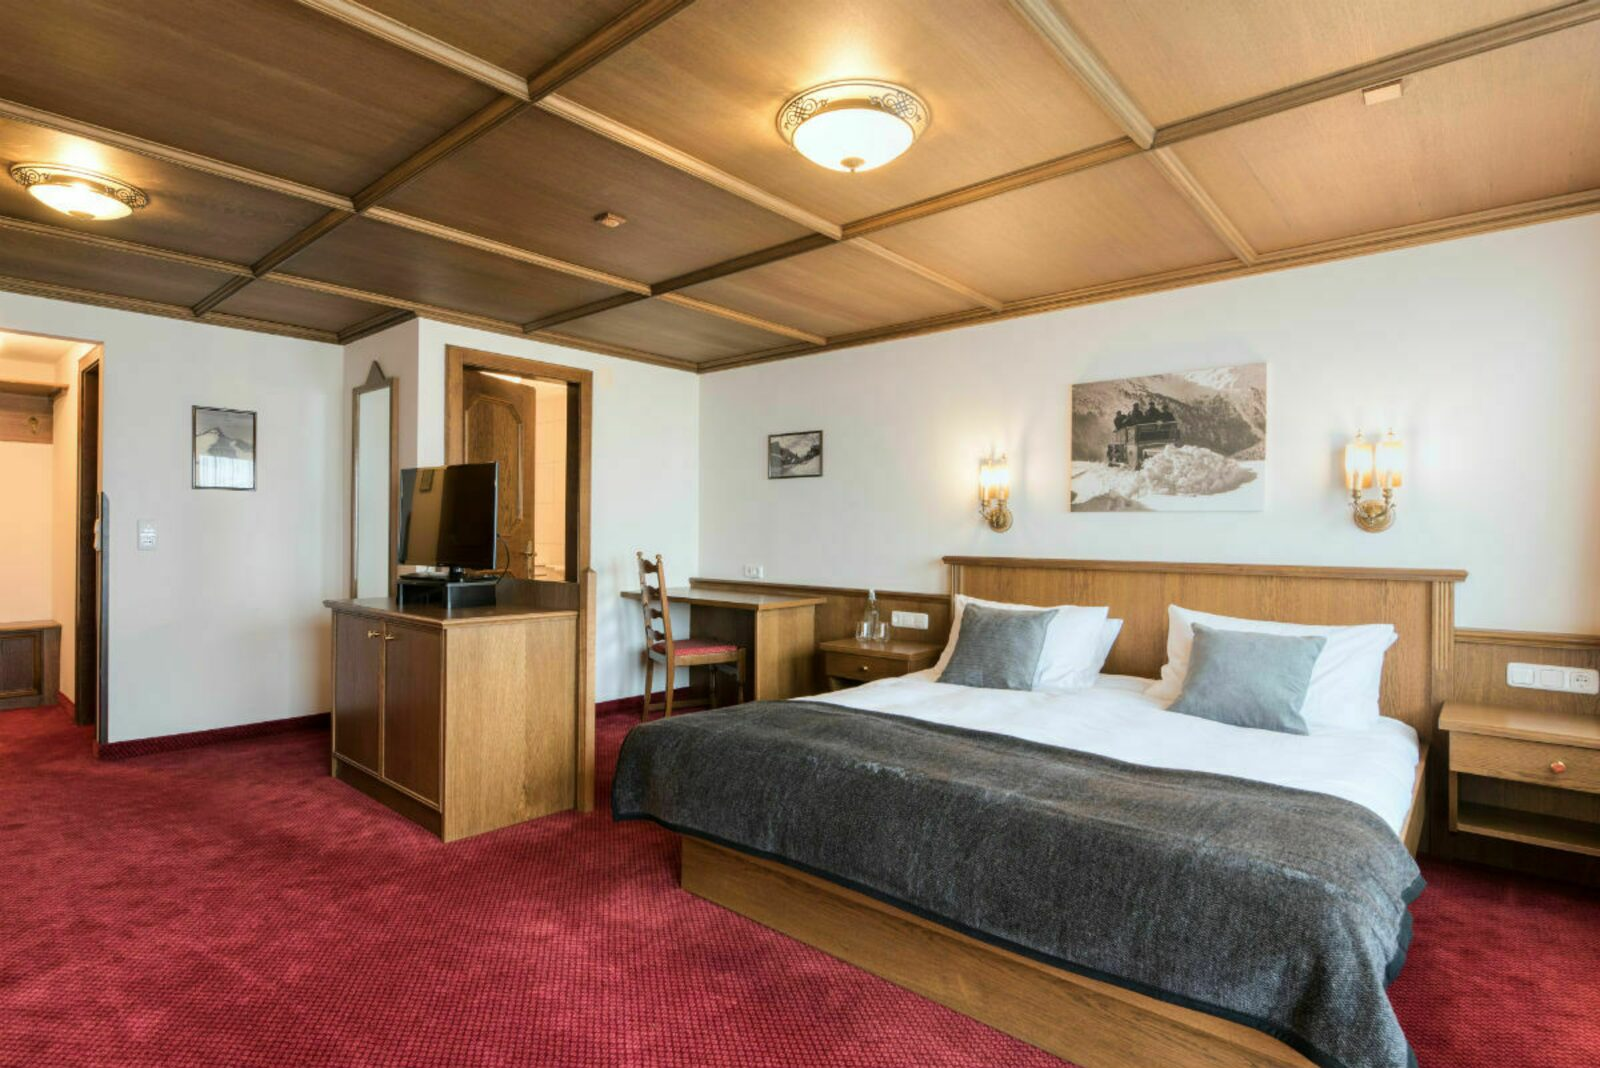 Hotelzimmer Deluxe | 2-4 Pers.